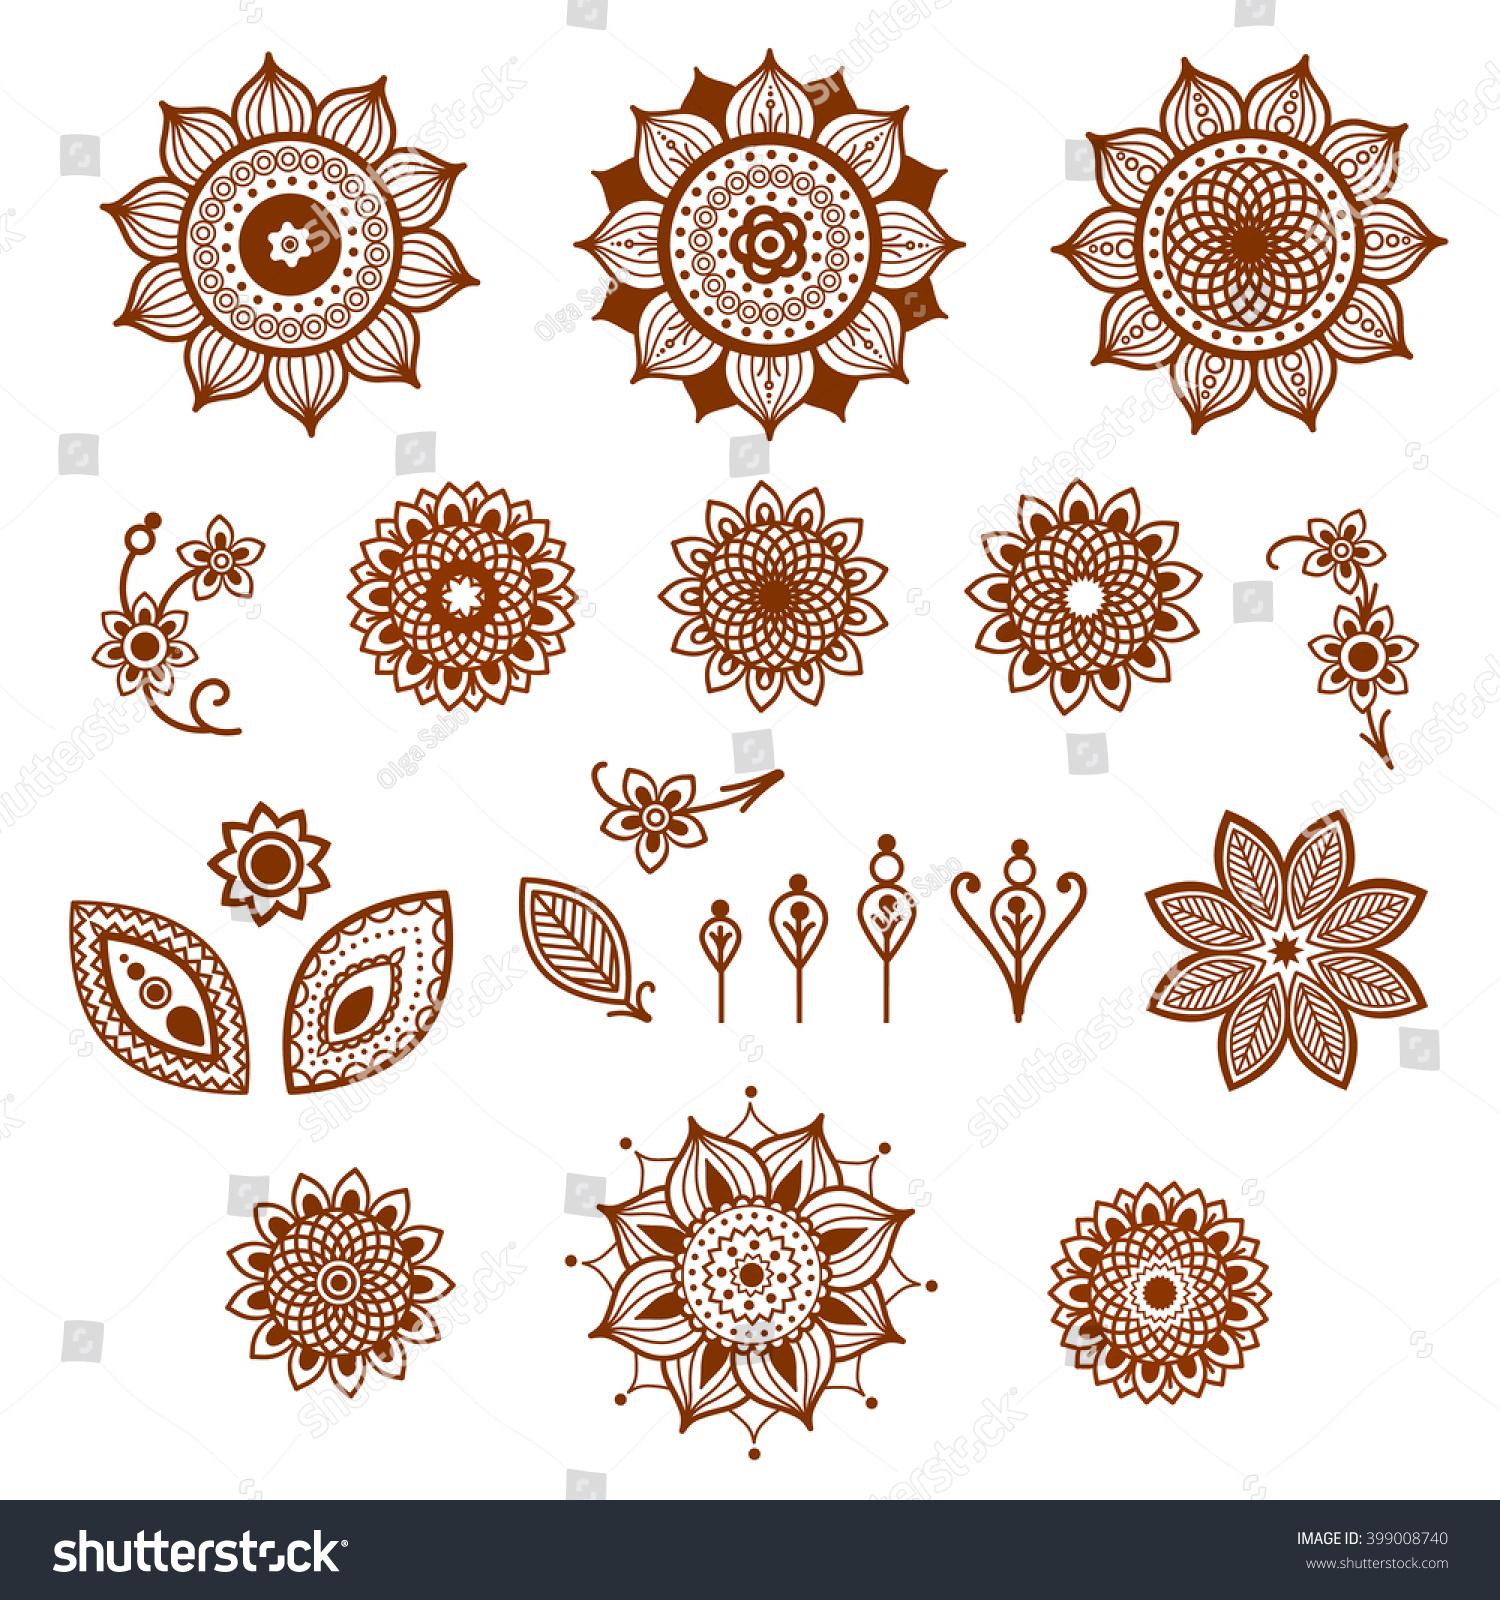 Henna Ornamental Floral Elements Mehndi Style Different